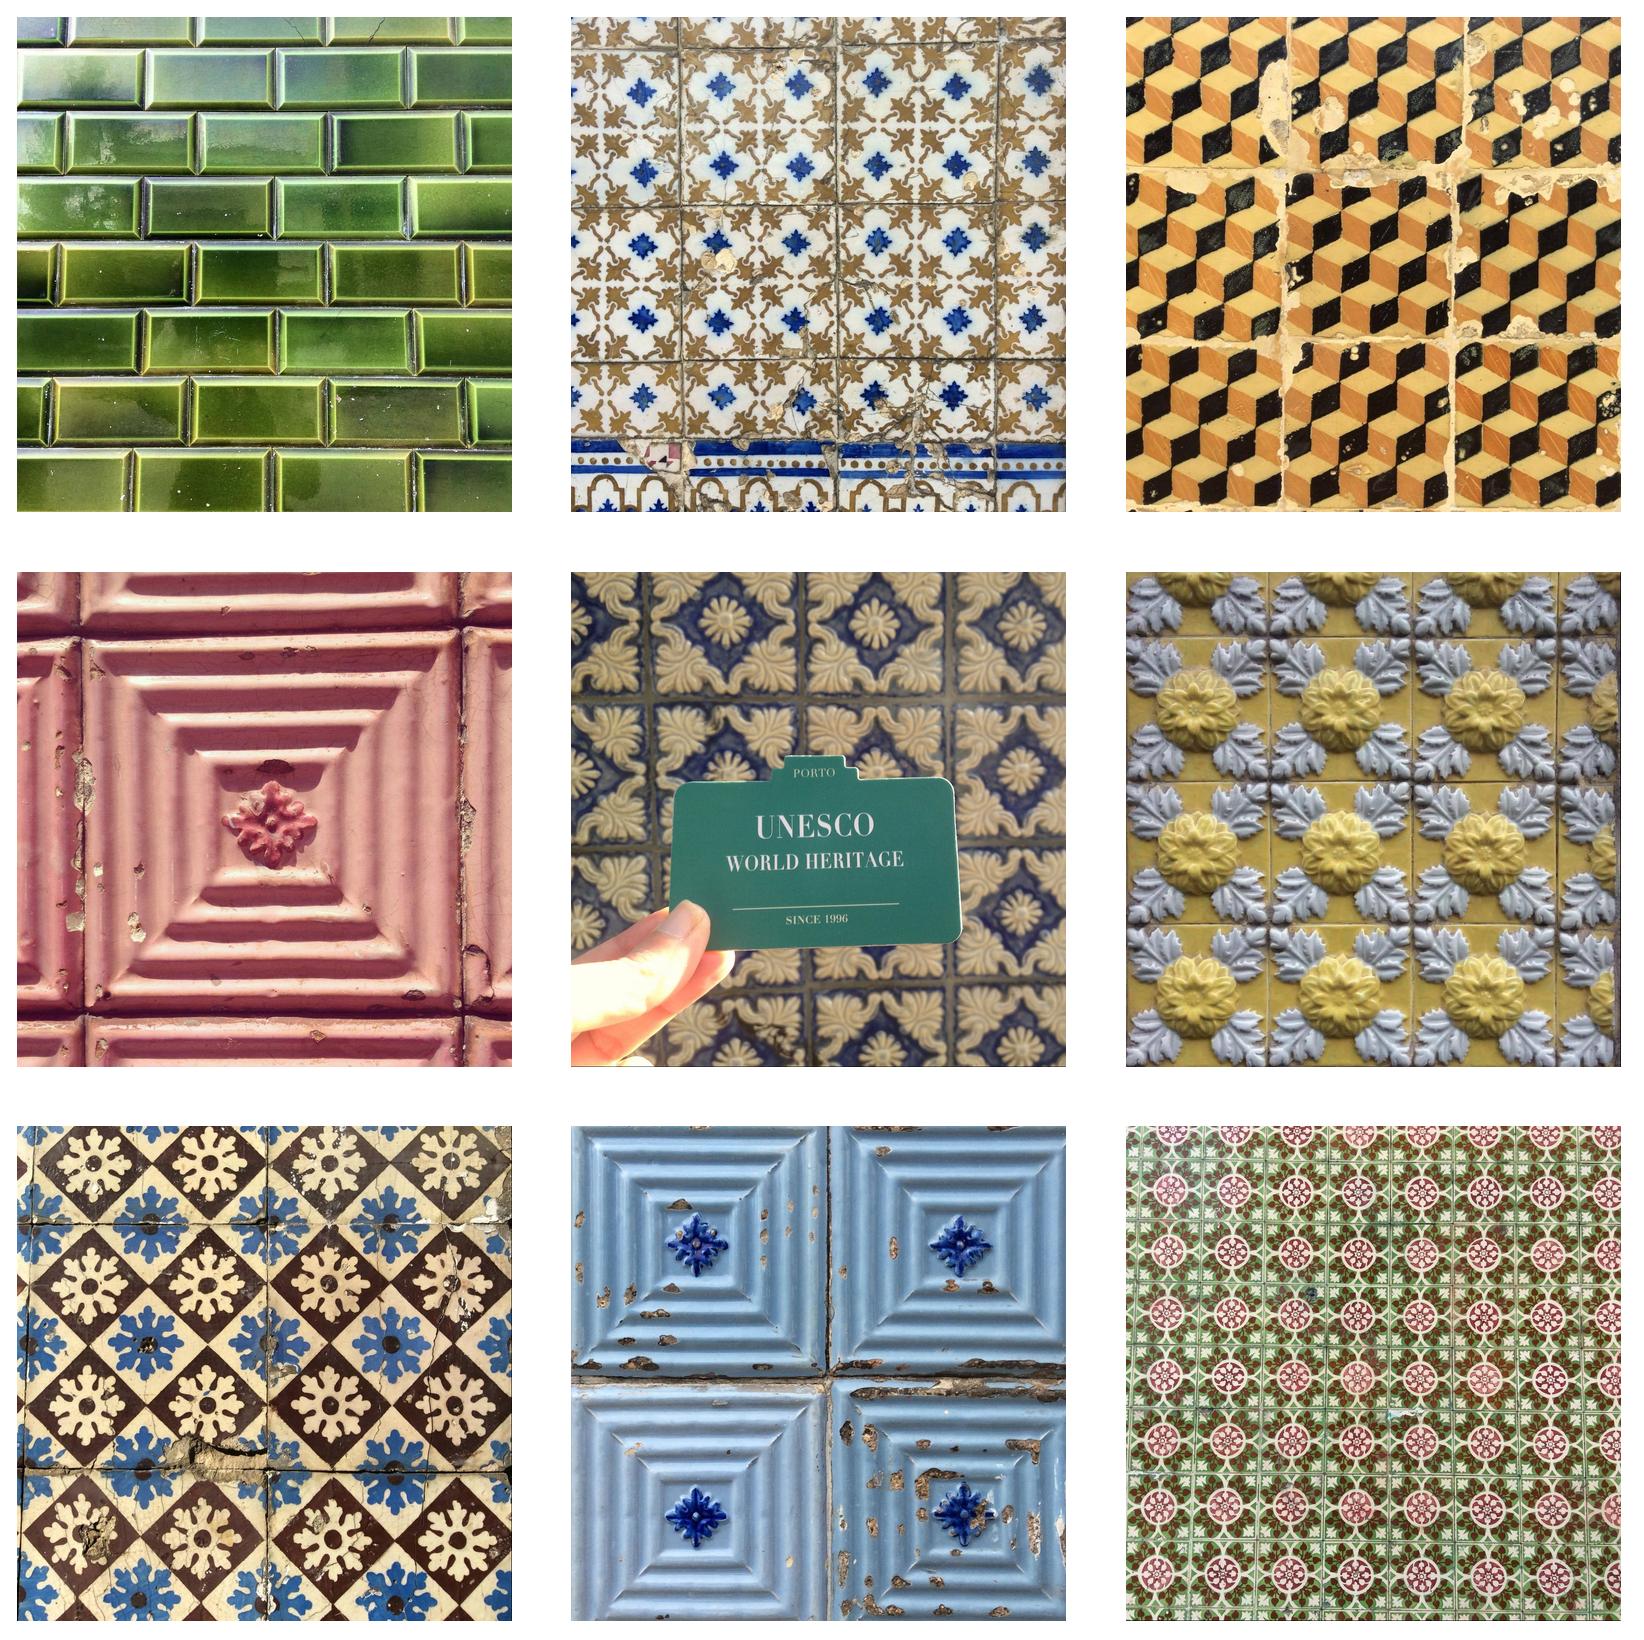 azulejos-porto